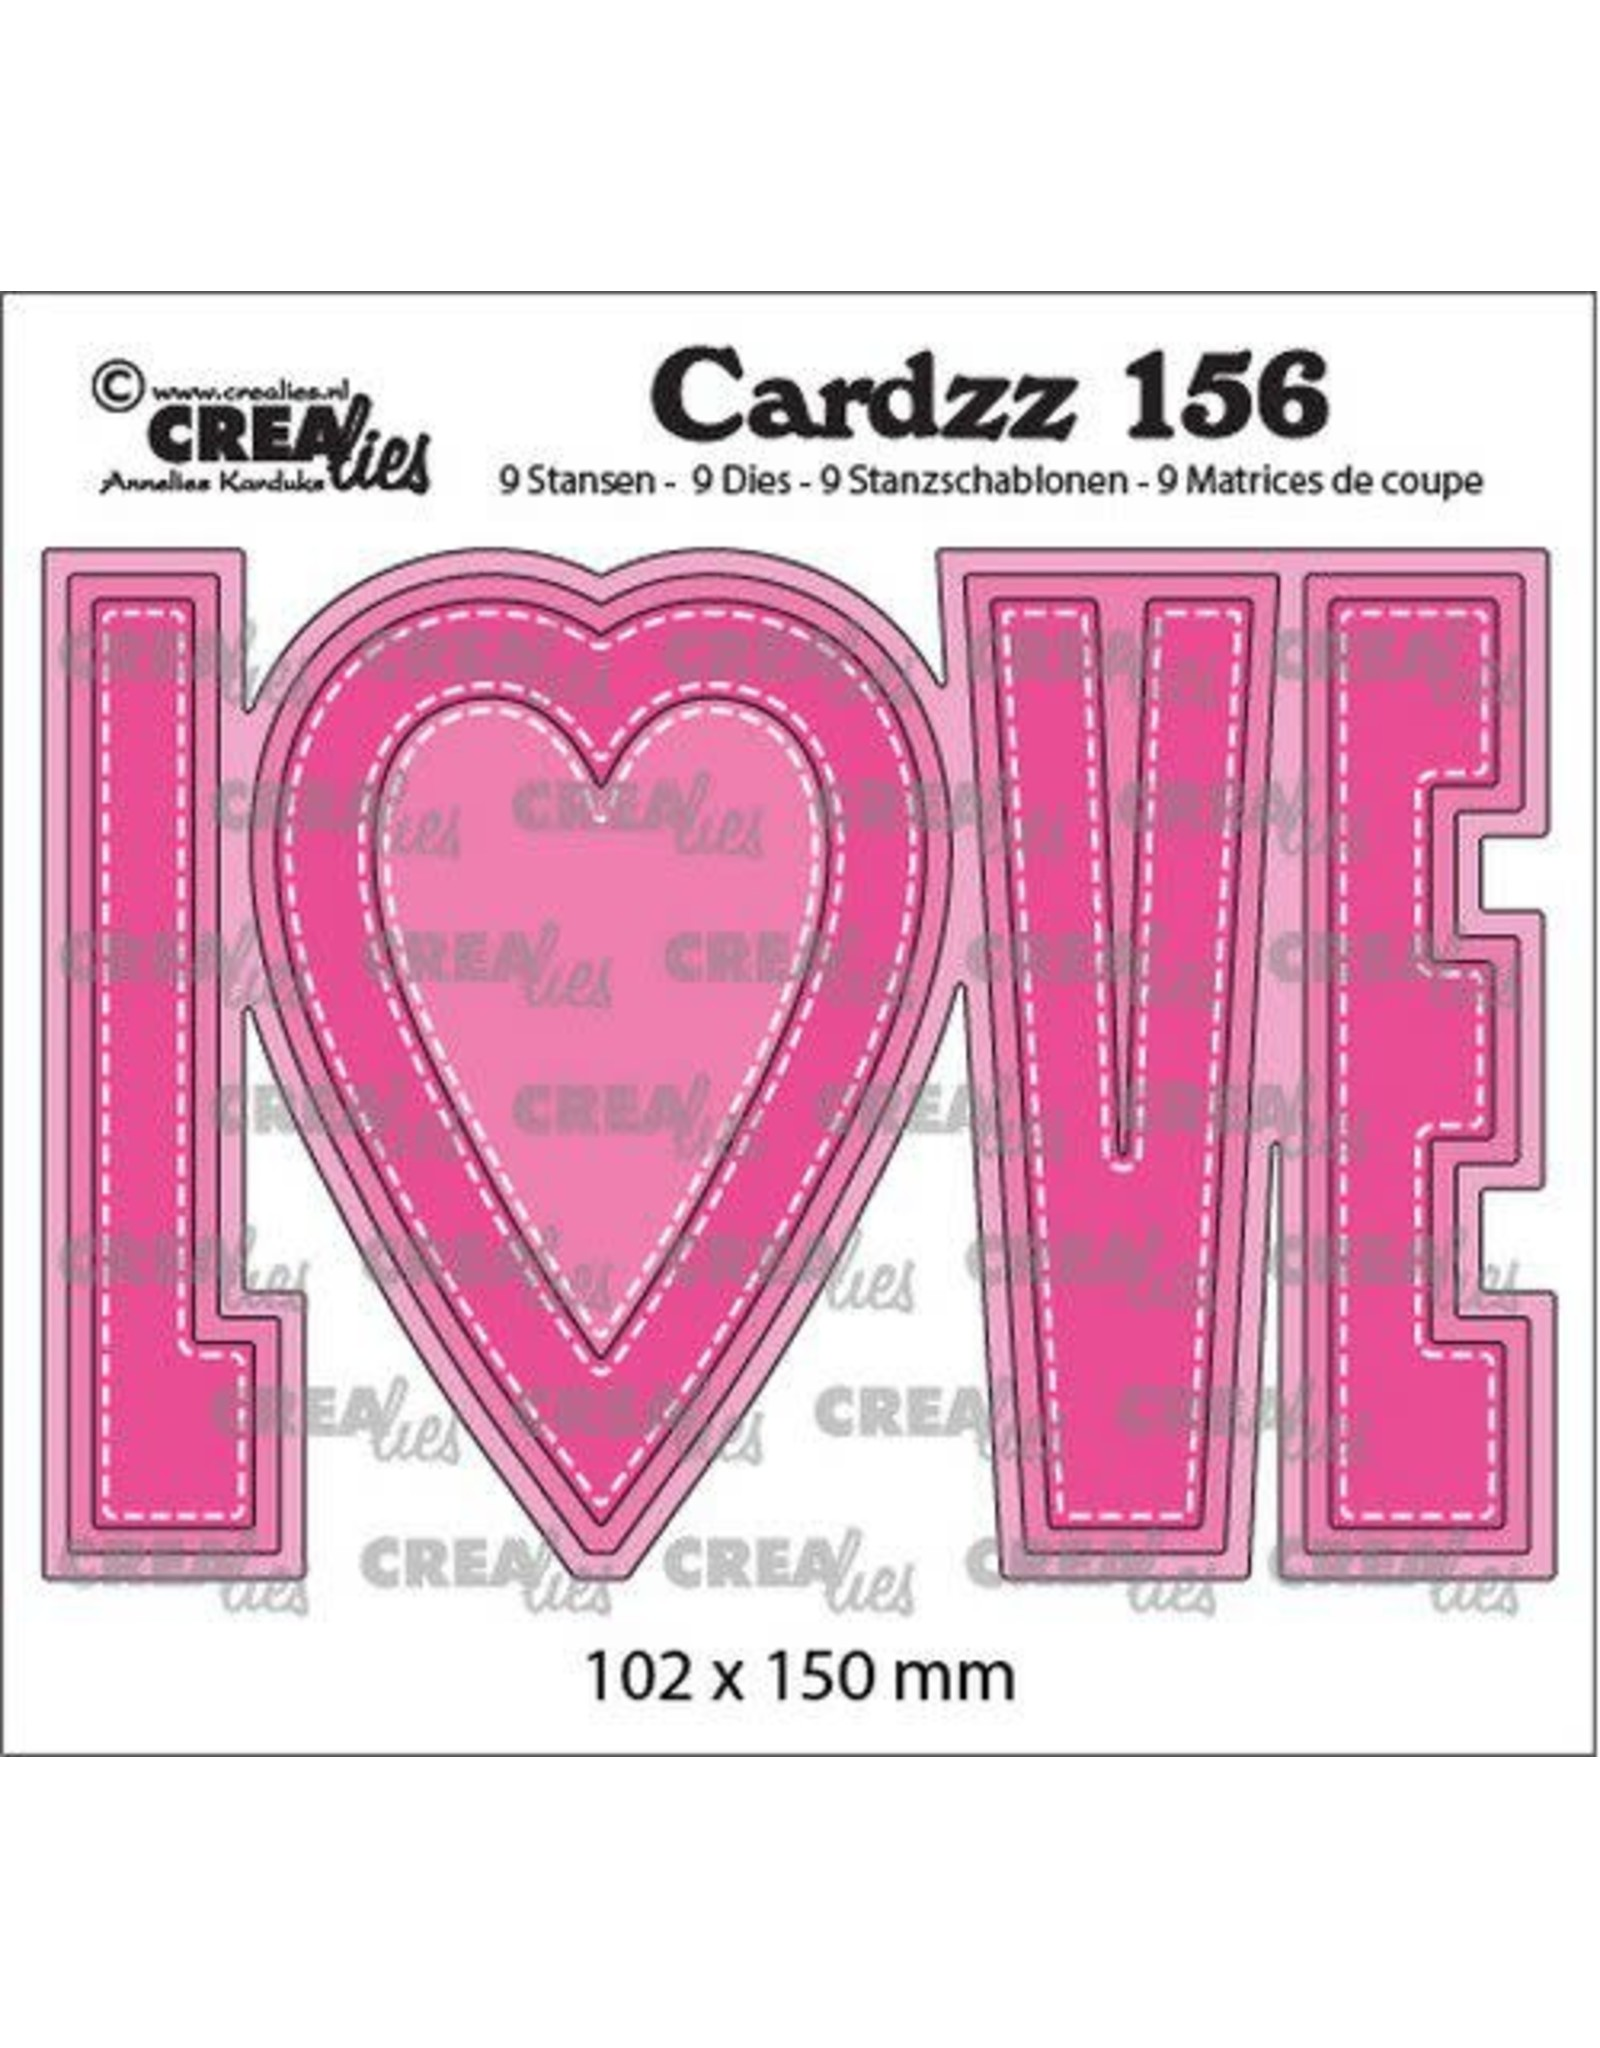 Crealies Crealies Cardzz no 156 LOVE (ENG) CLCZ156 102x150mm